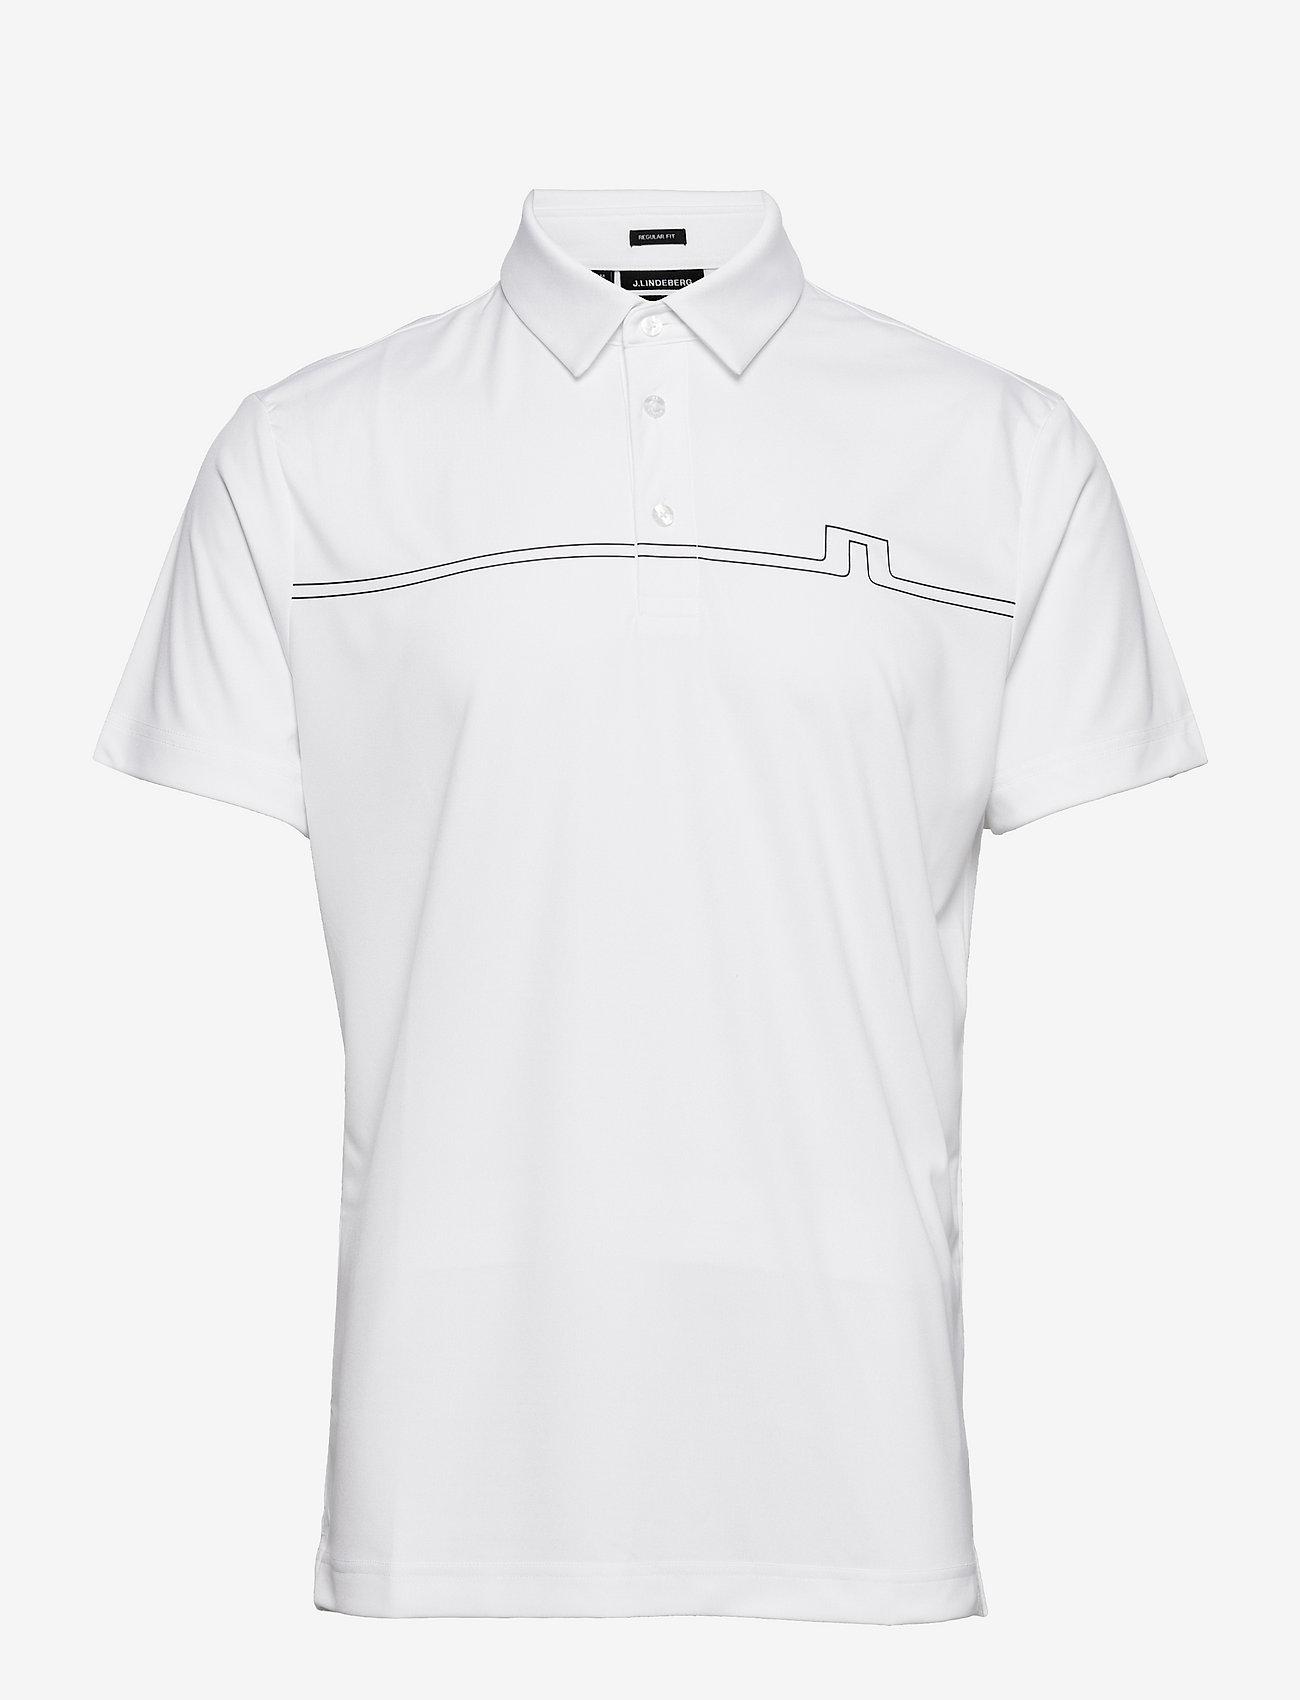 J. Lindeberg Golf - Clay Regular Fit Golf Polo - pik - white - 1